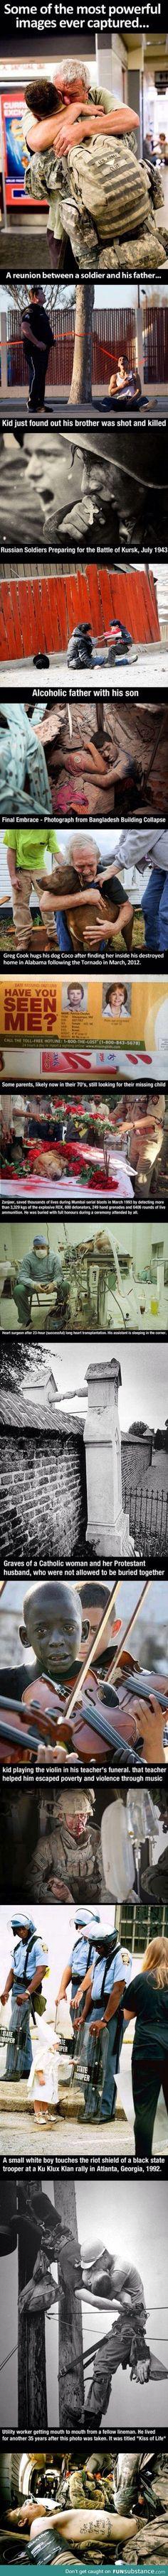 Powerful photographs